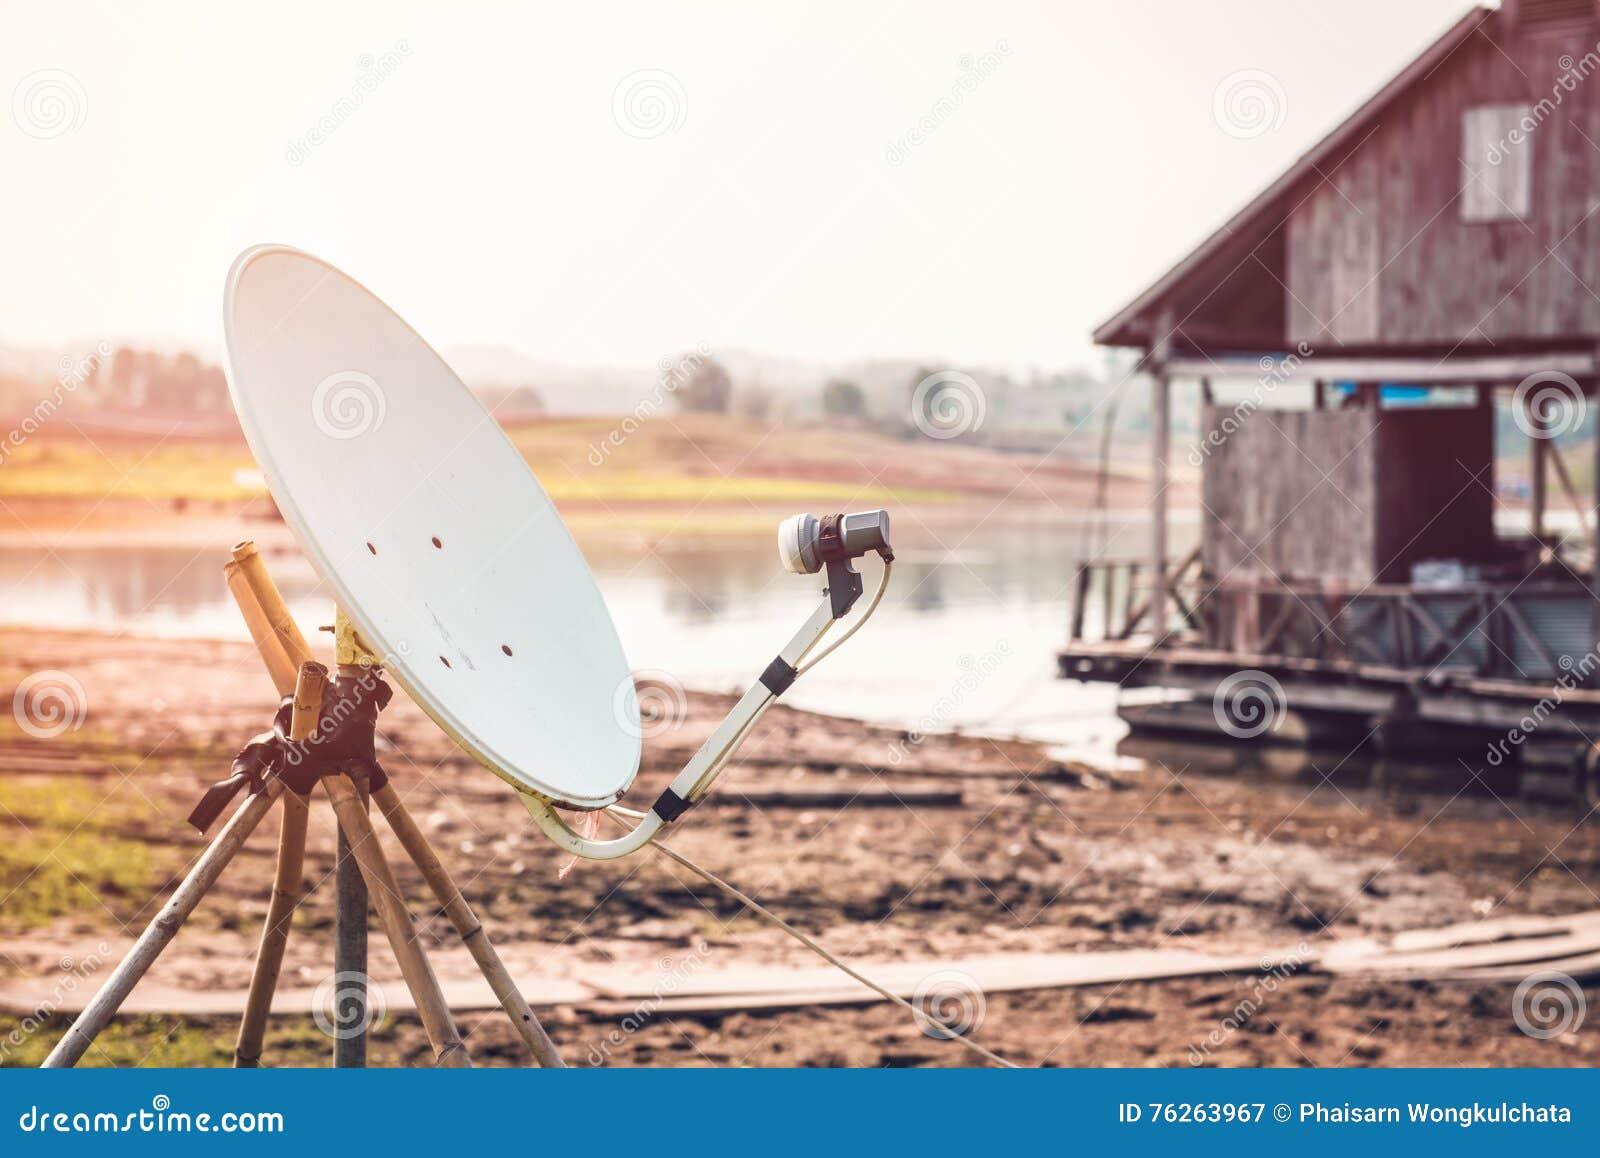 Satellit- disk som installeras i bygden